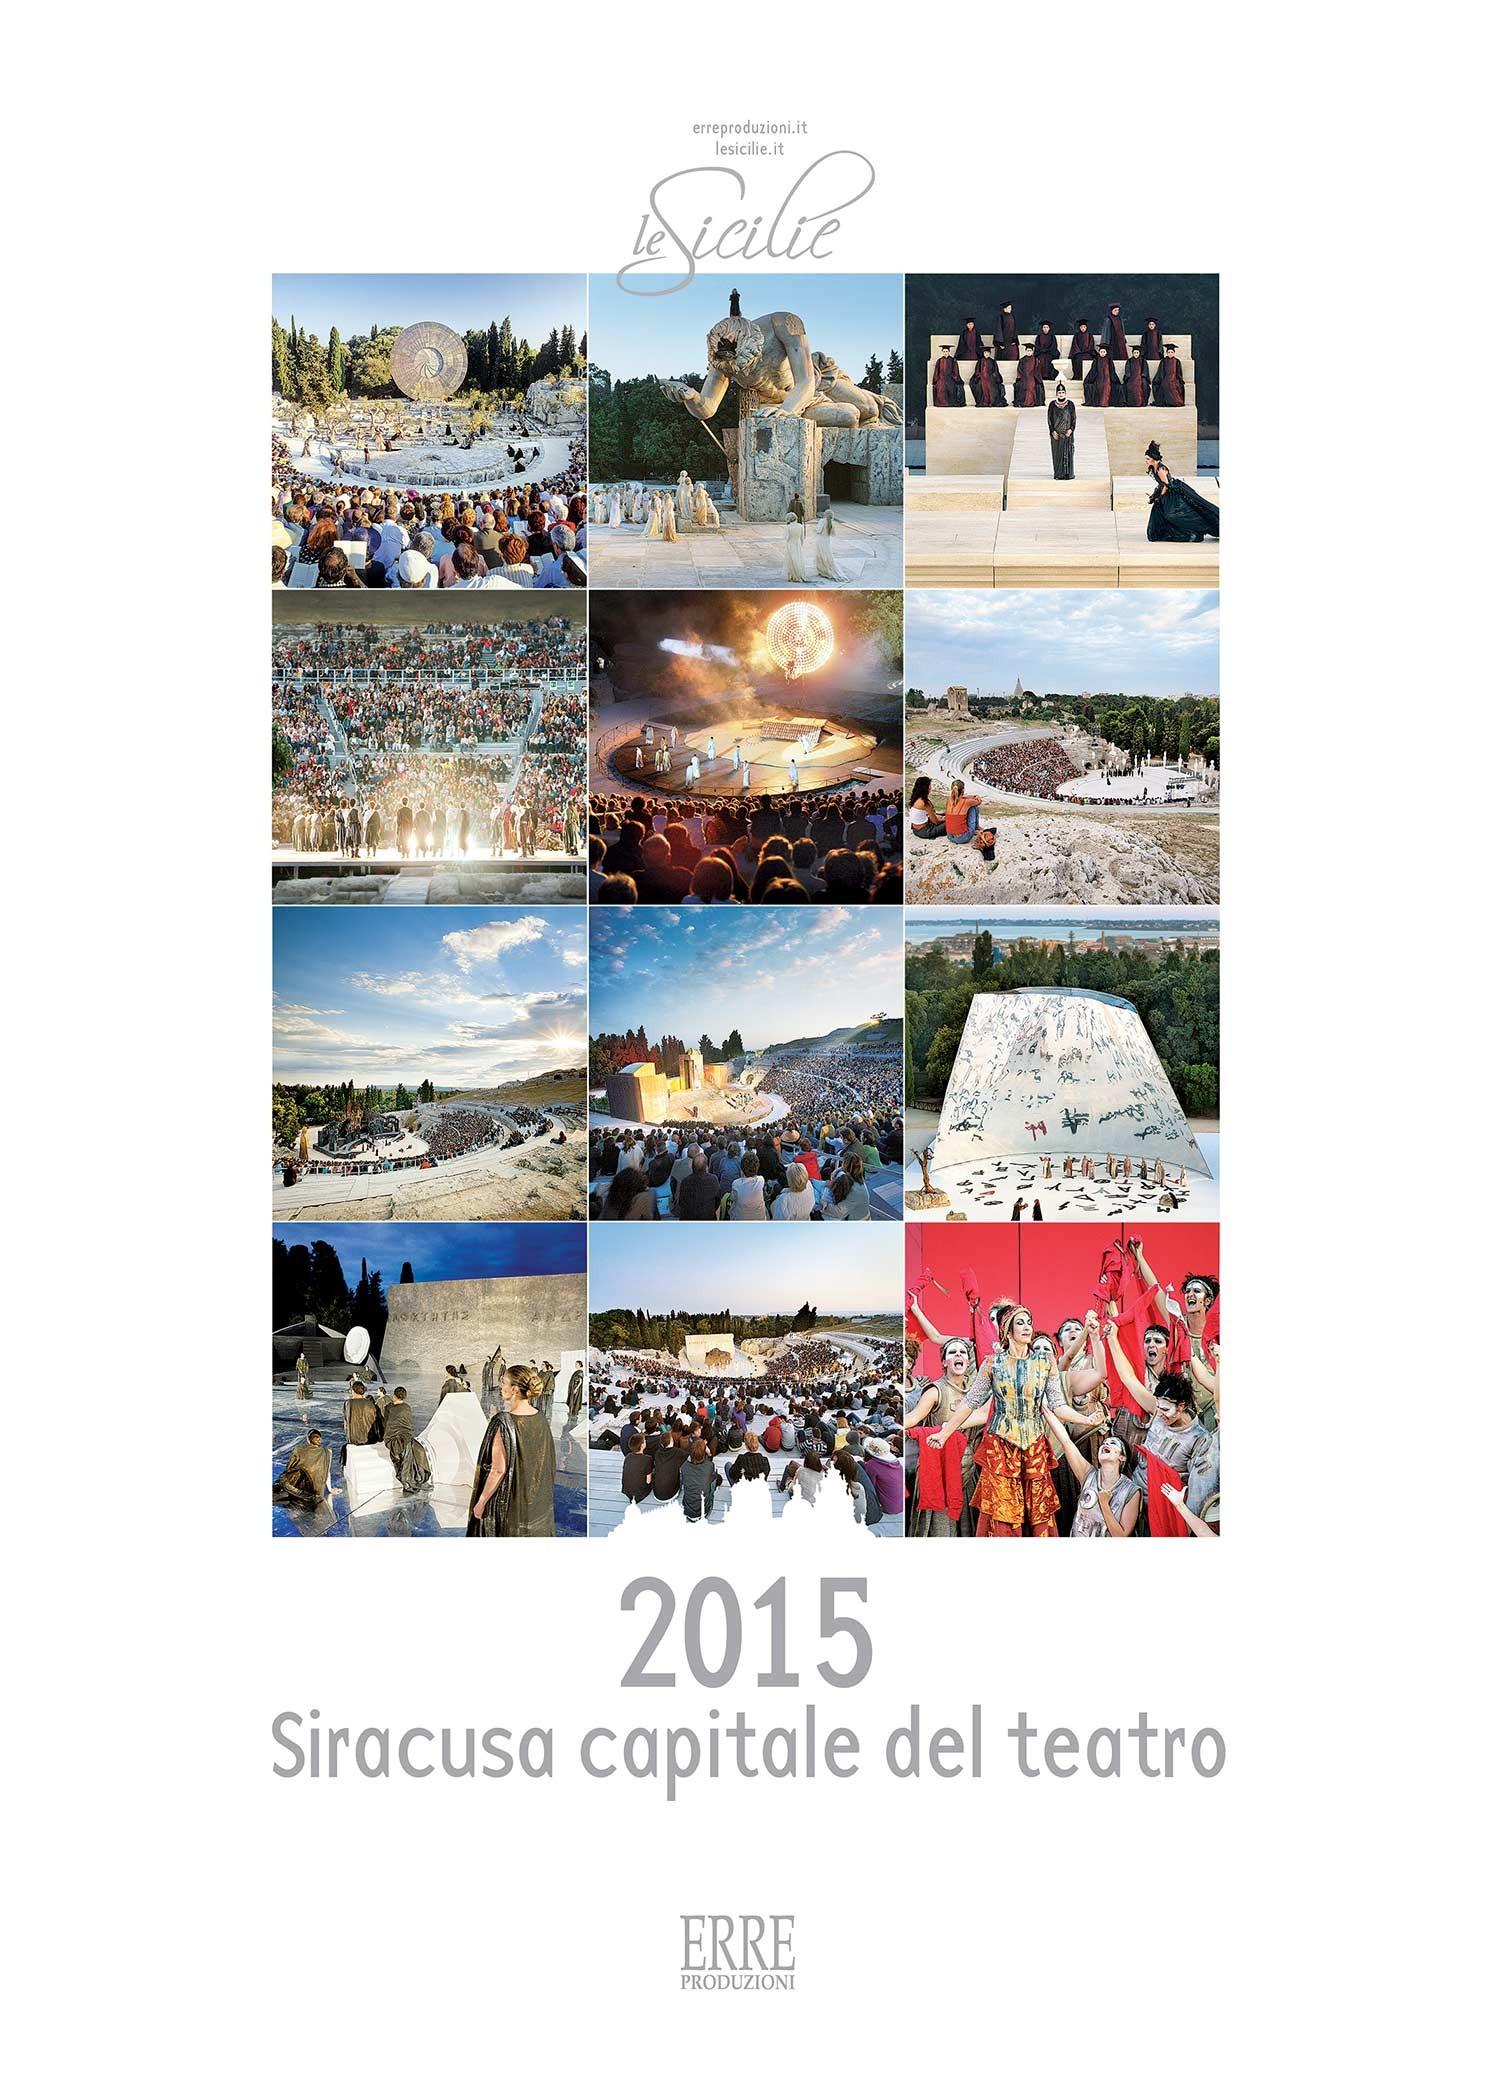 Siracusa Capitale del teatro- art calendar2014/15